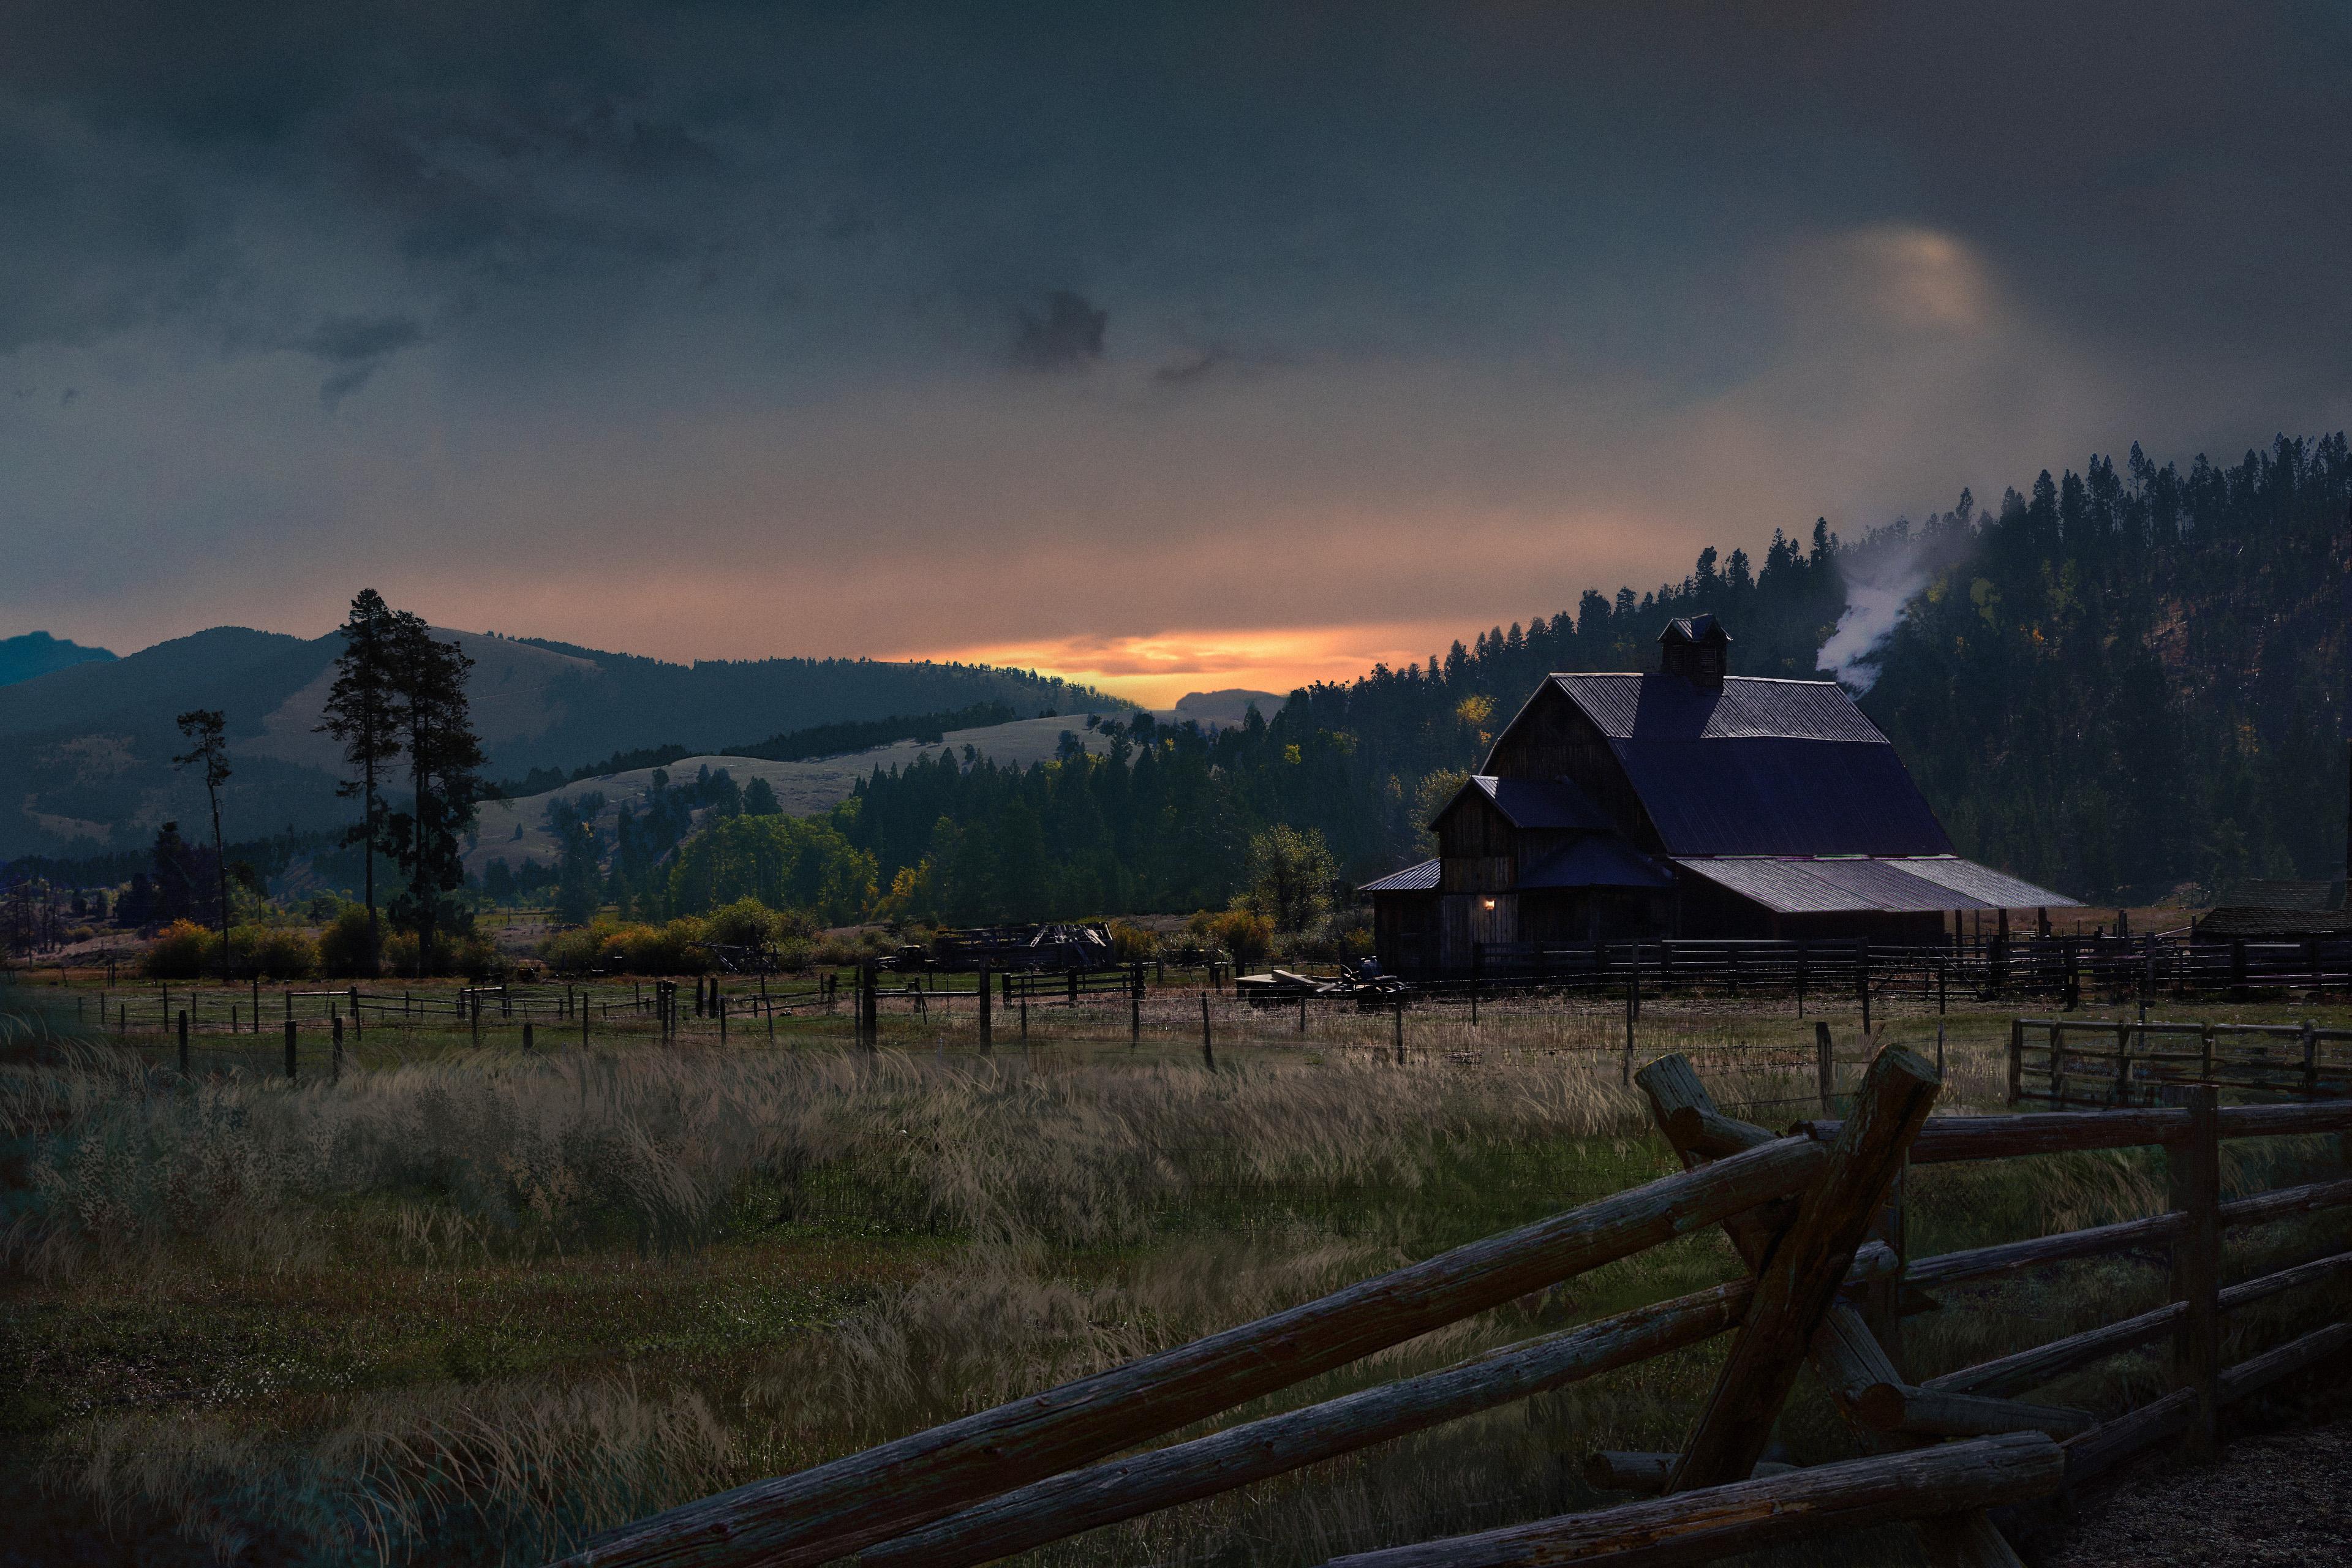 Far Cry 5 Wallpaper 4k: Far Cry 5 4k Ultra HD Wallpaper